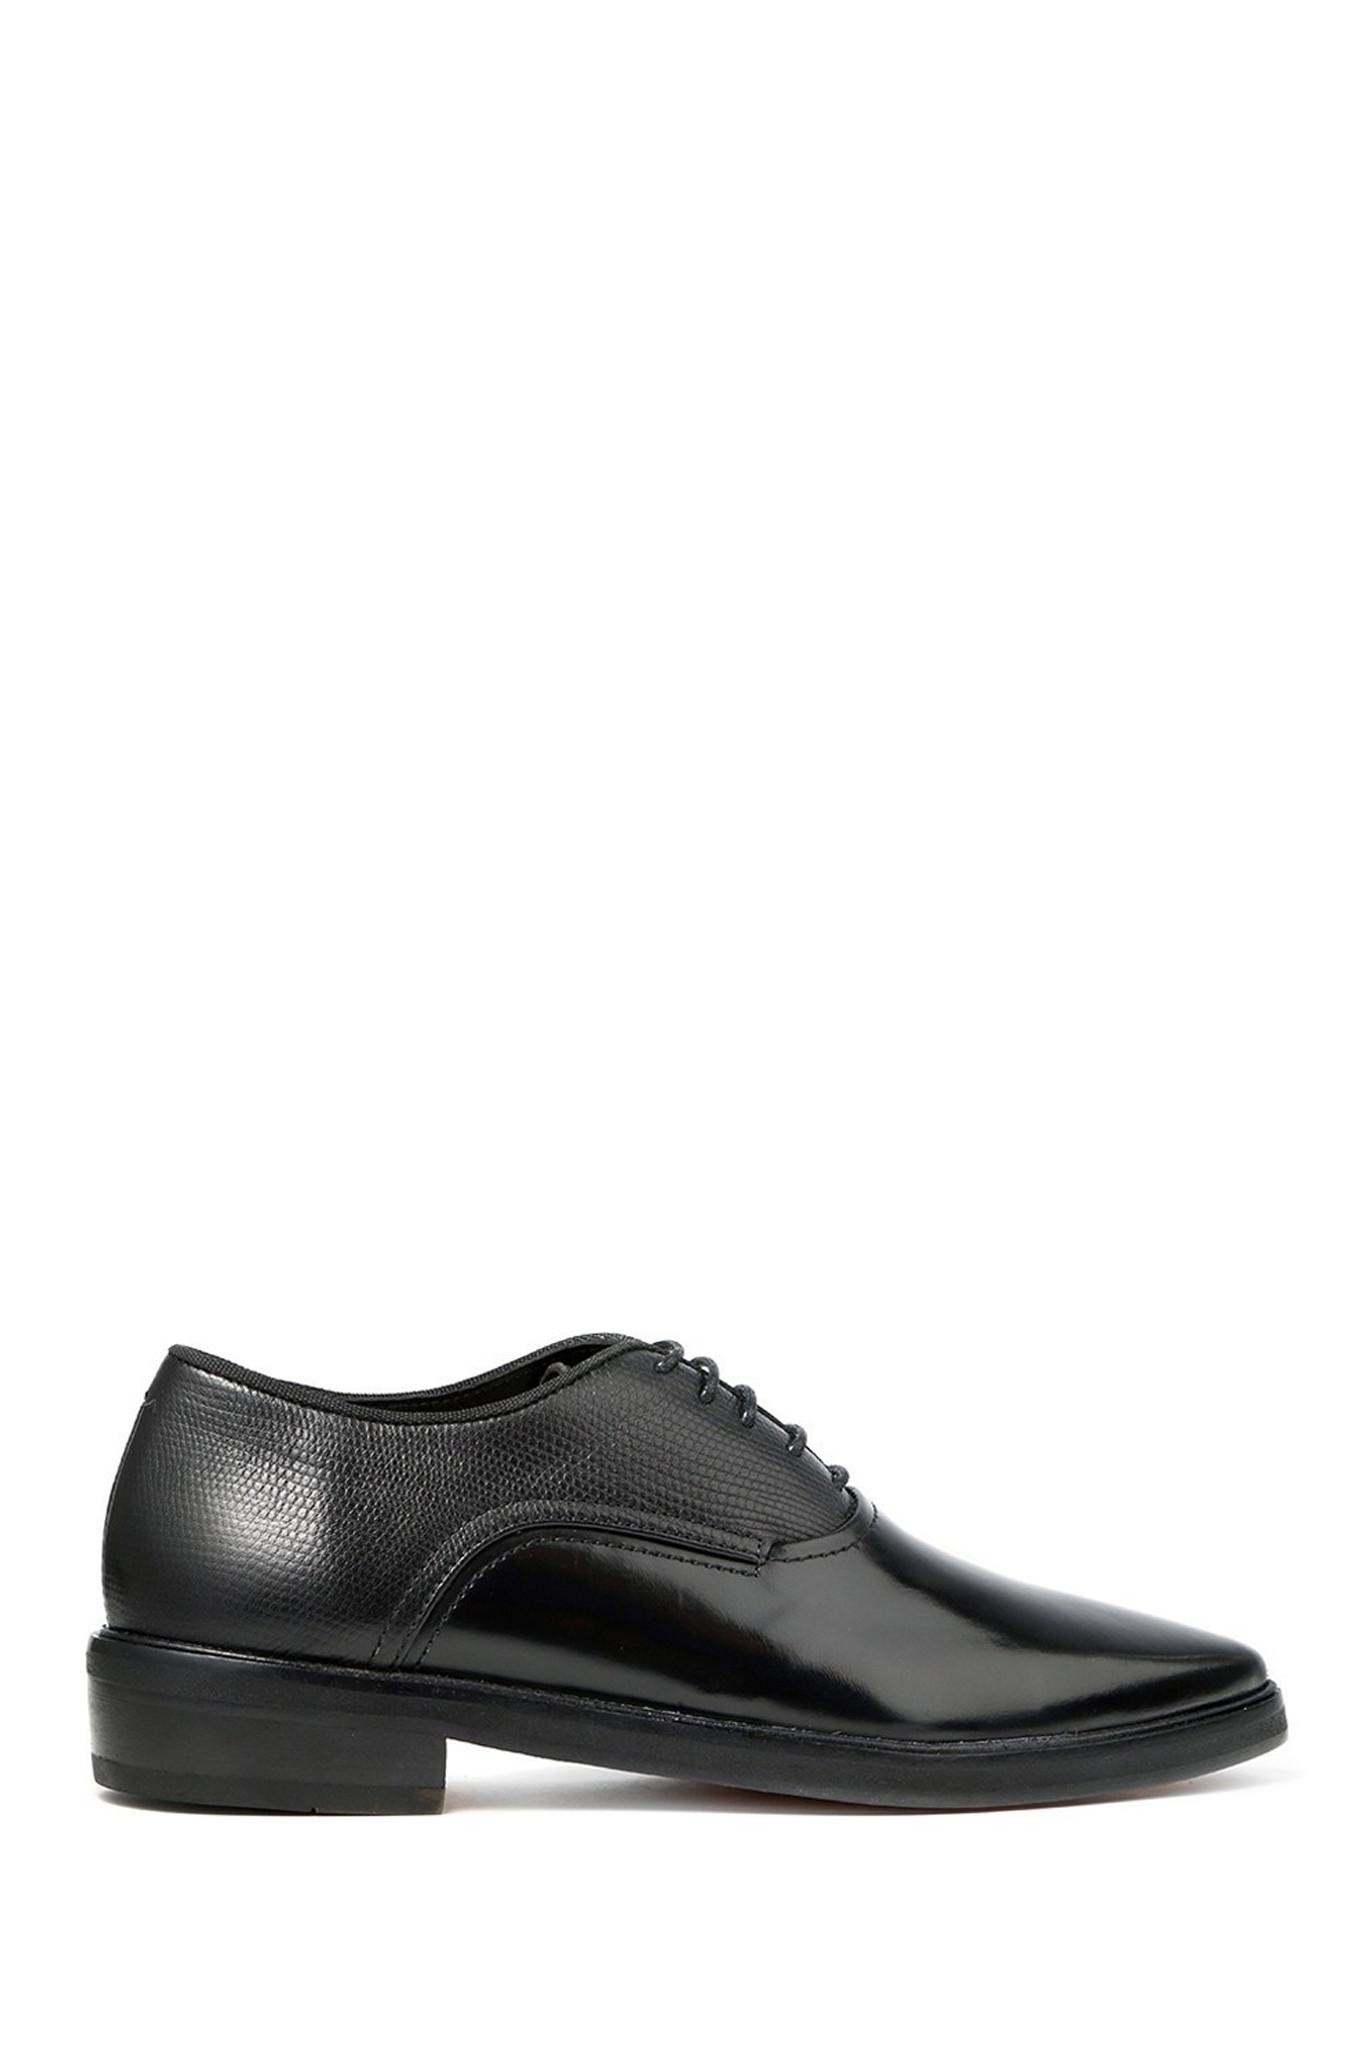 h by hudson atitlan oxford shoe in black lyst. Black Bedroom Furniture Sets. Home Design Ideas